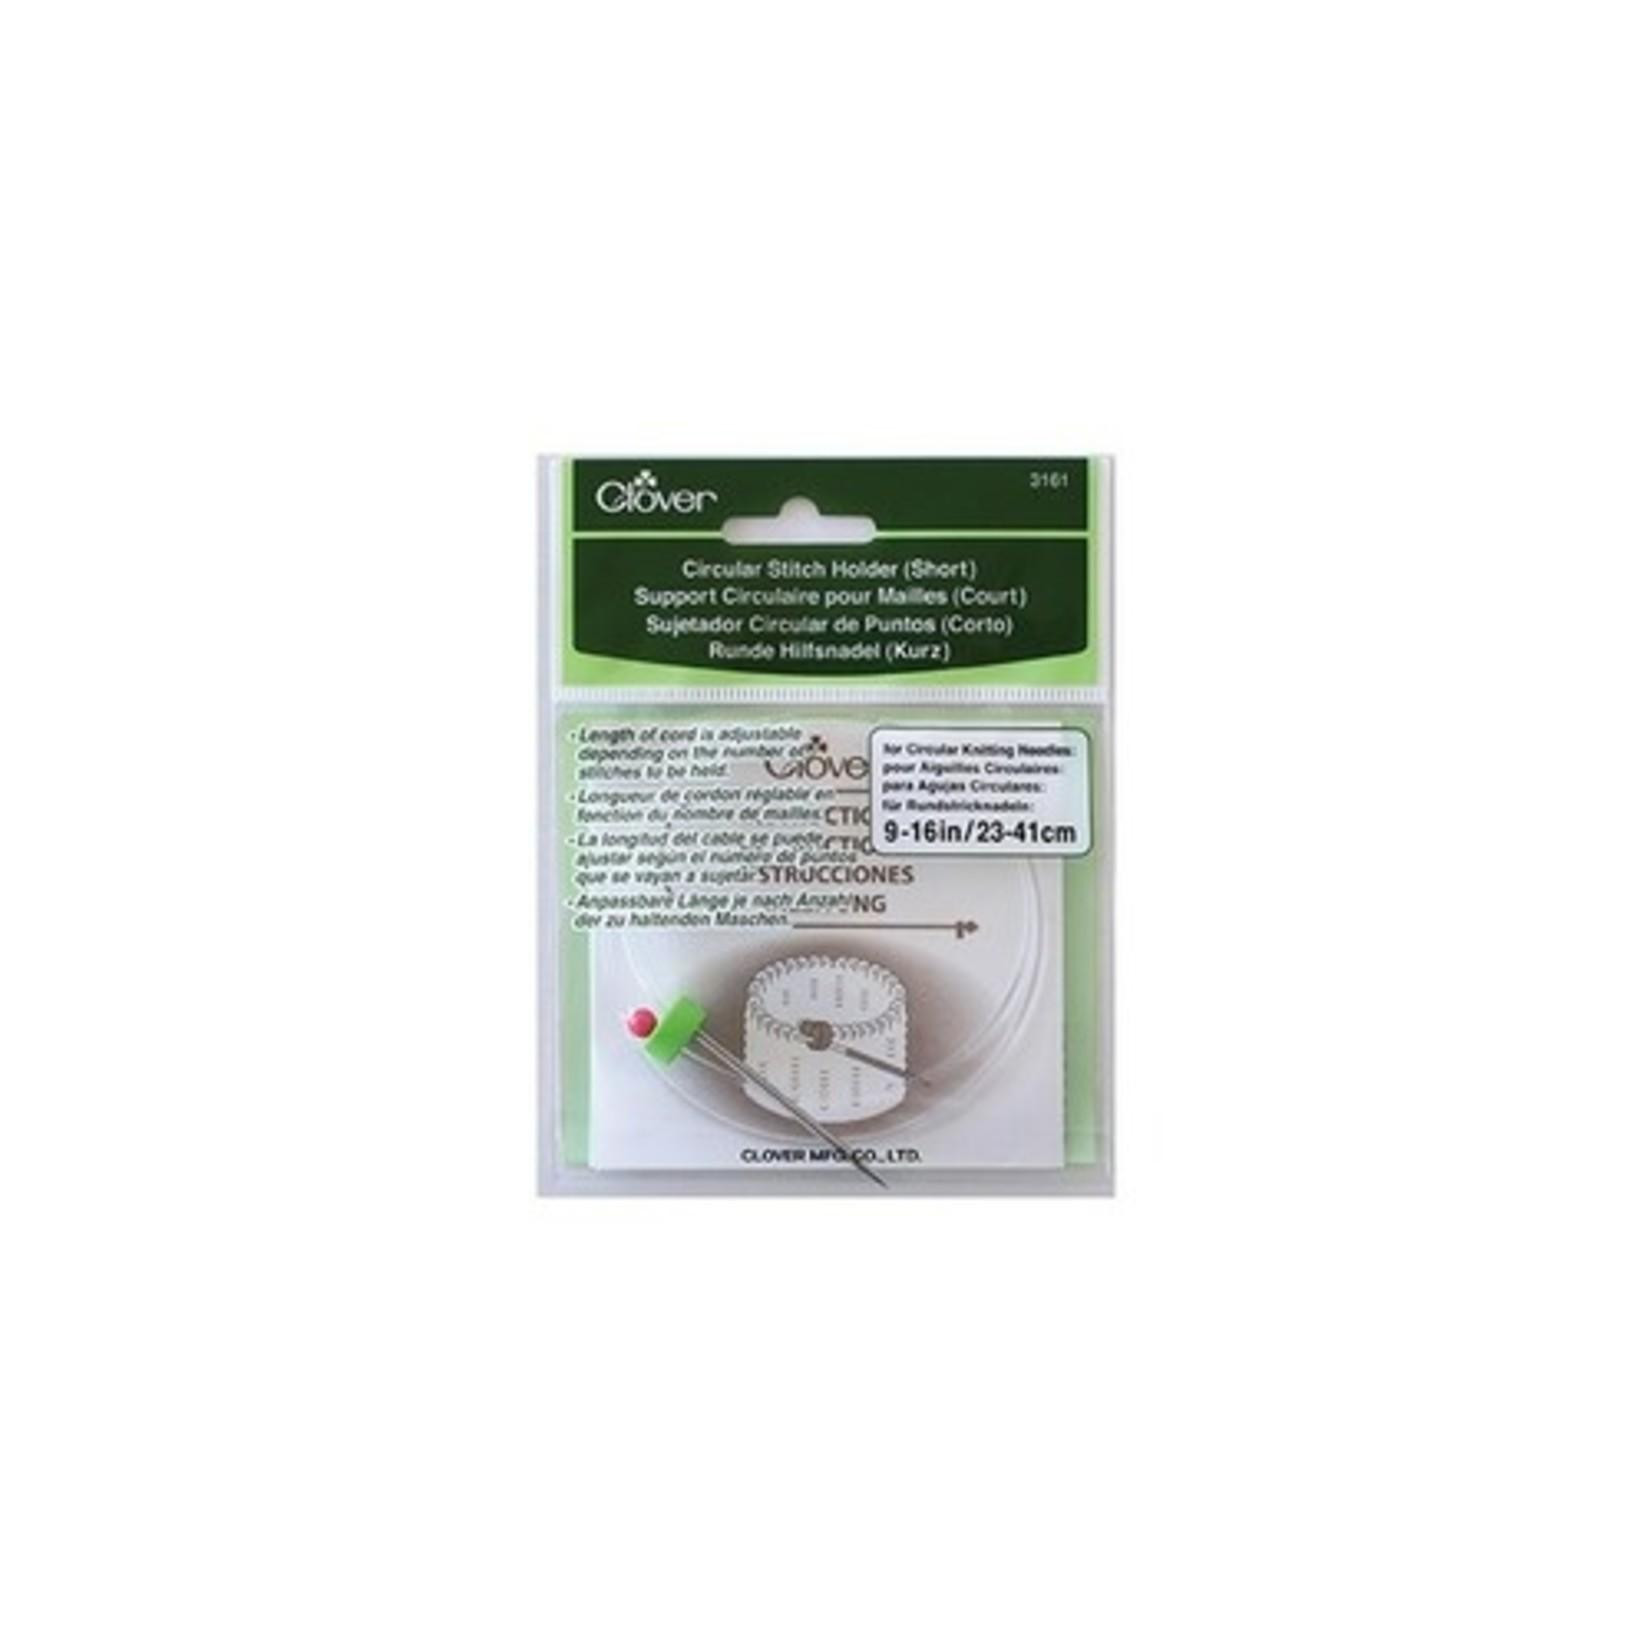 Delaware Dry Goods Circular Stitch Holder Short, 3161,